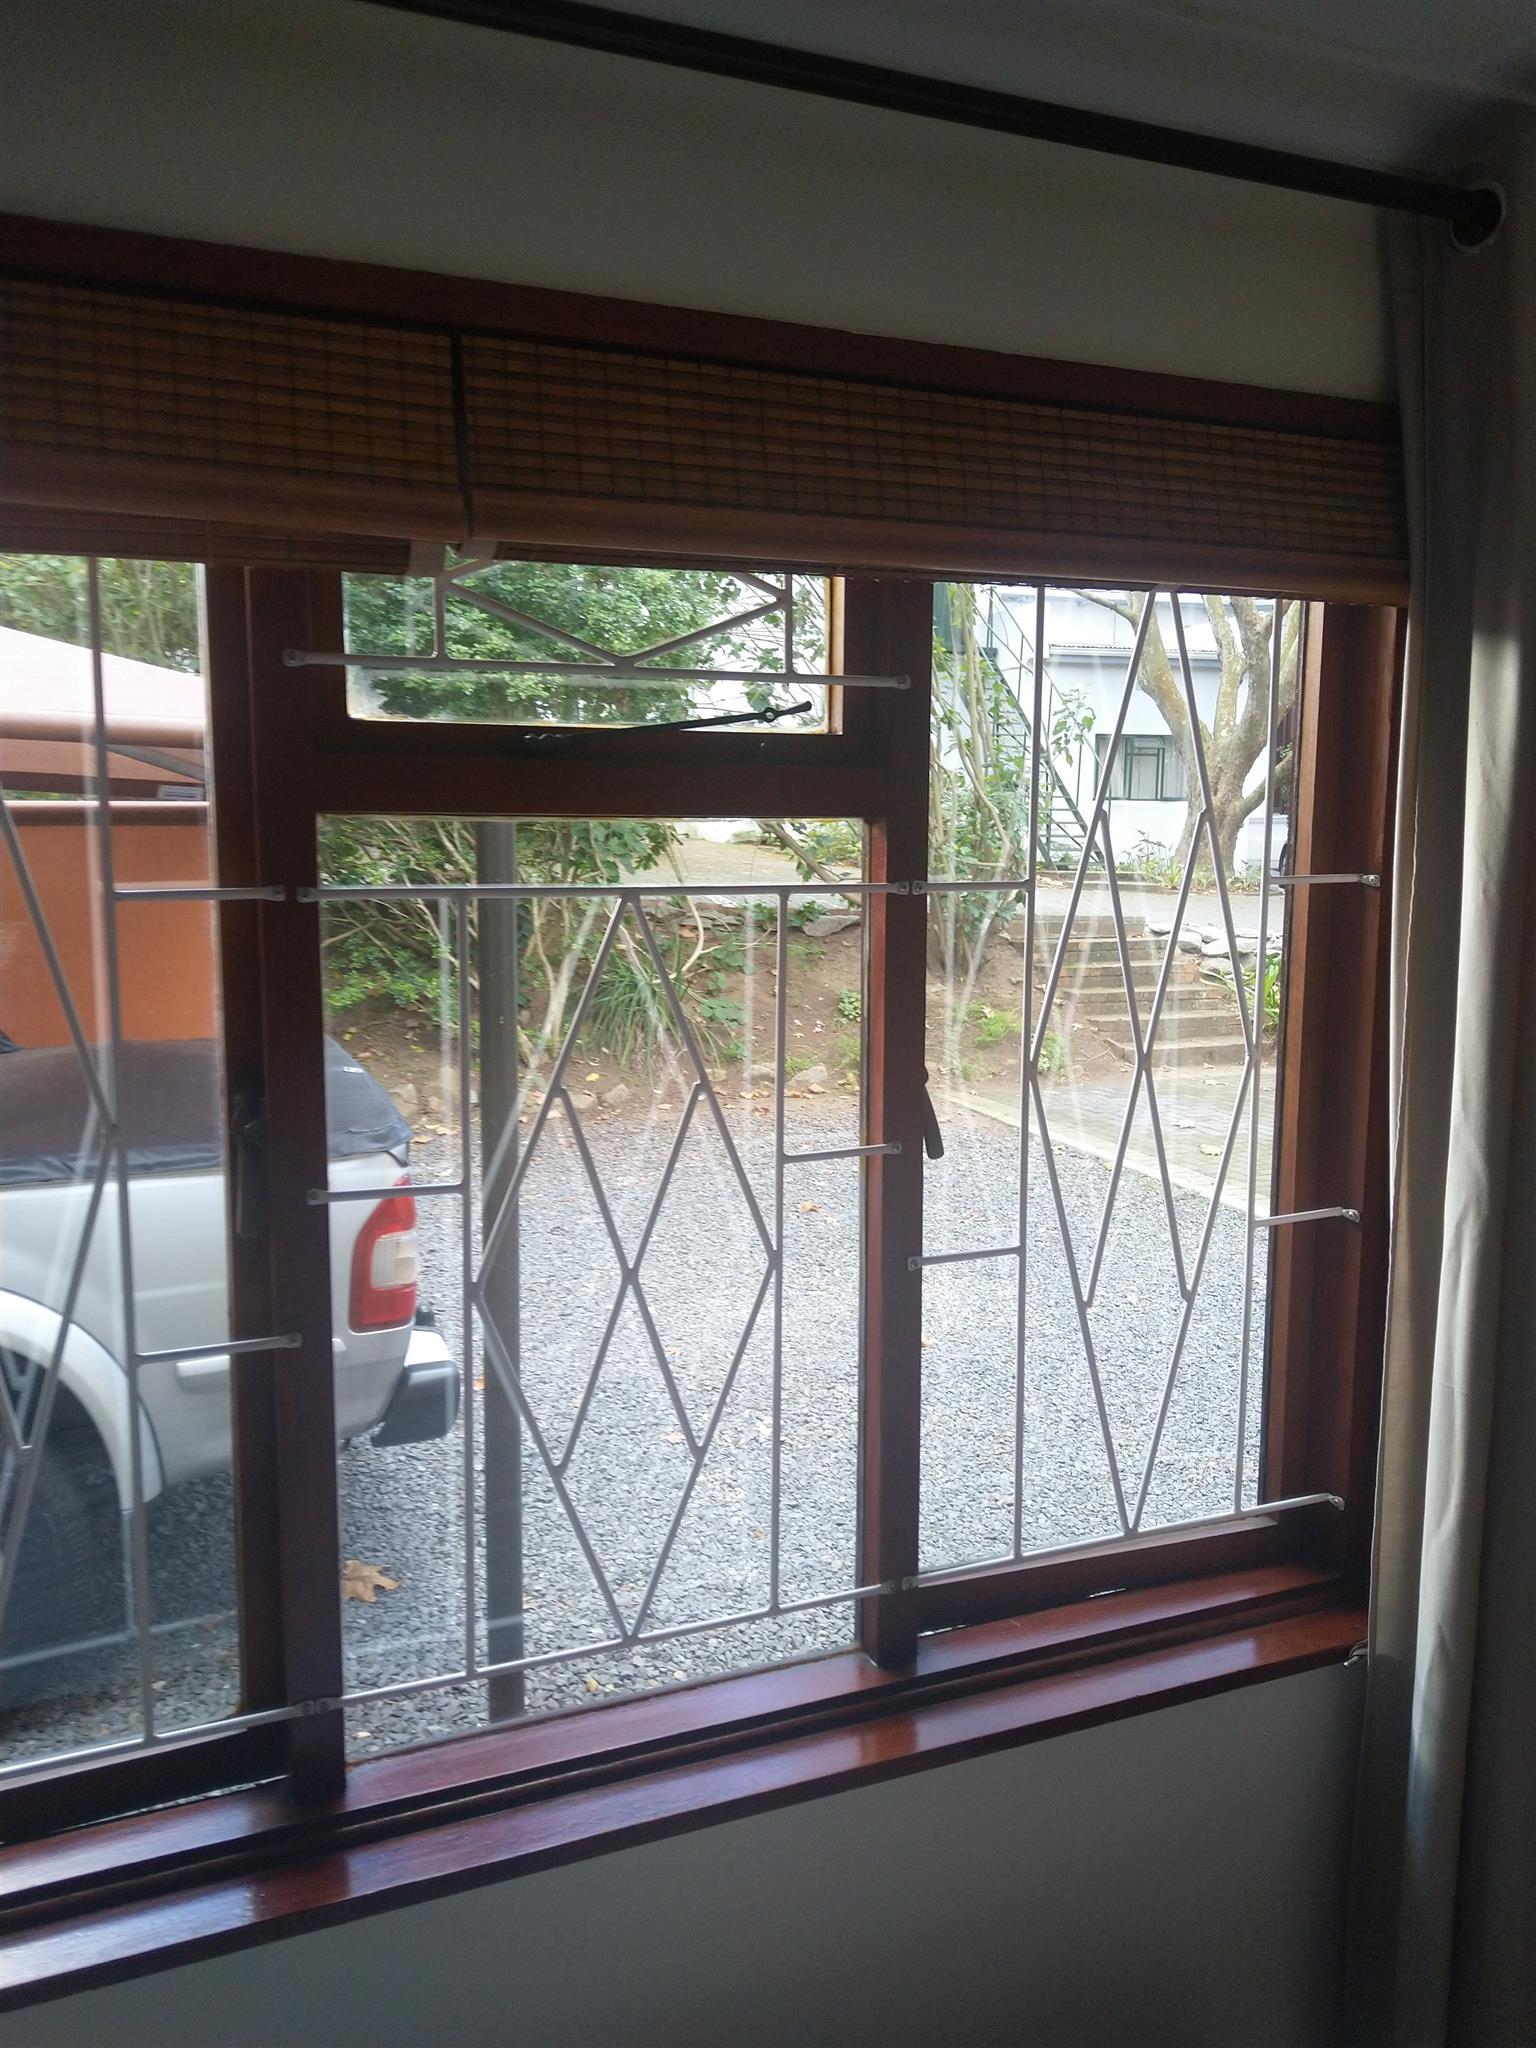 Window burglar bars for sale